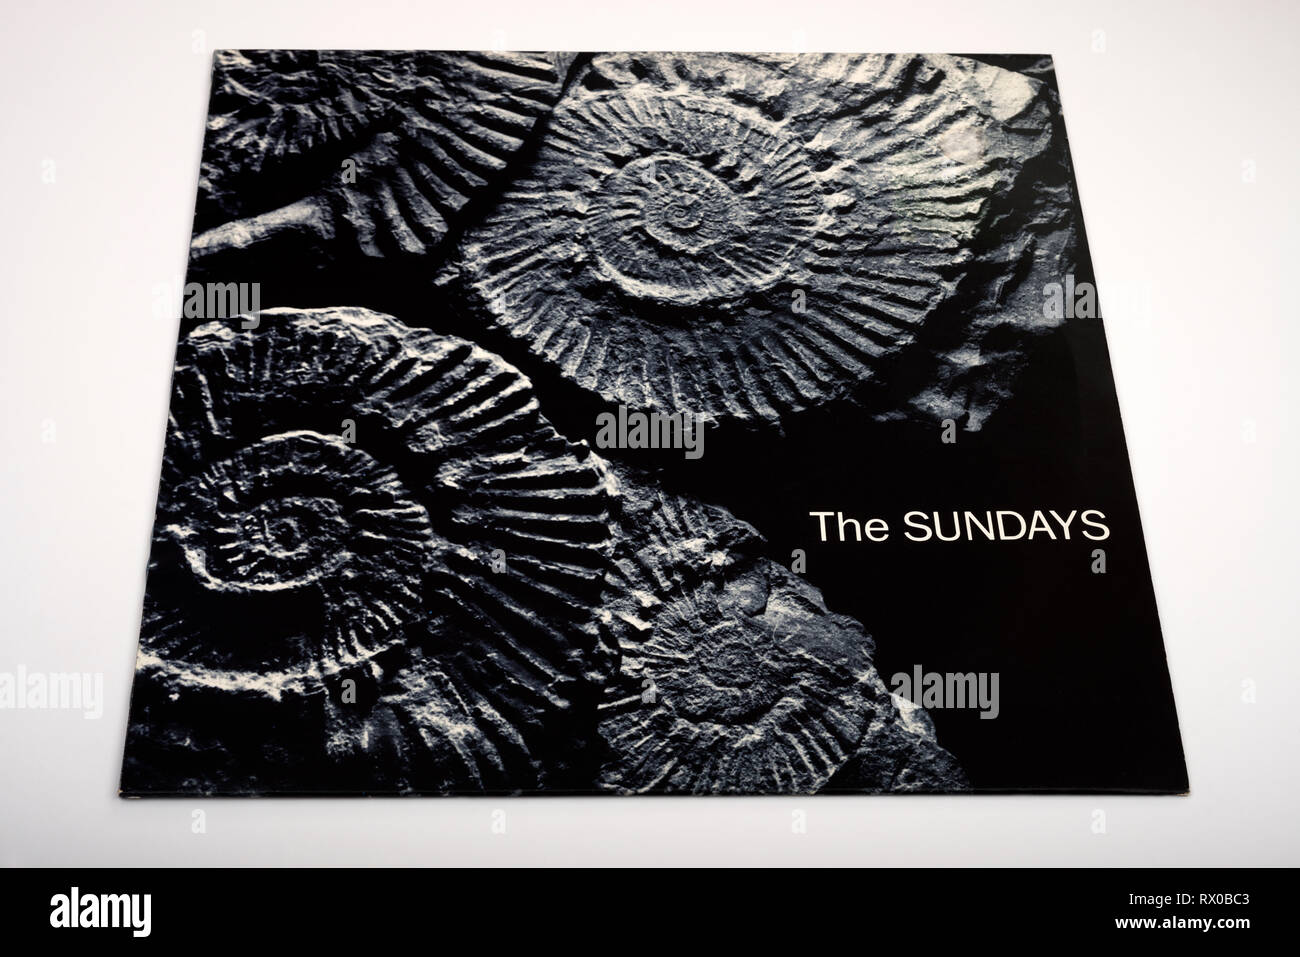 The Sundays vinyl LP record - Stock Image